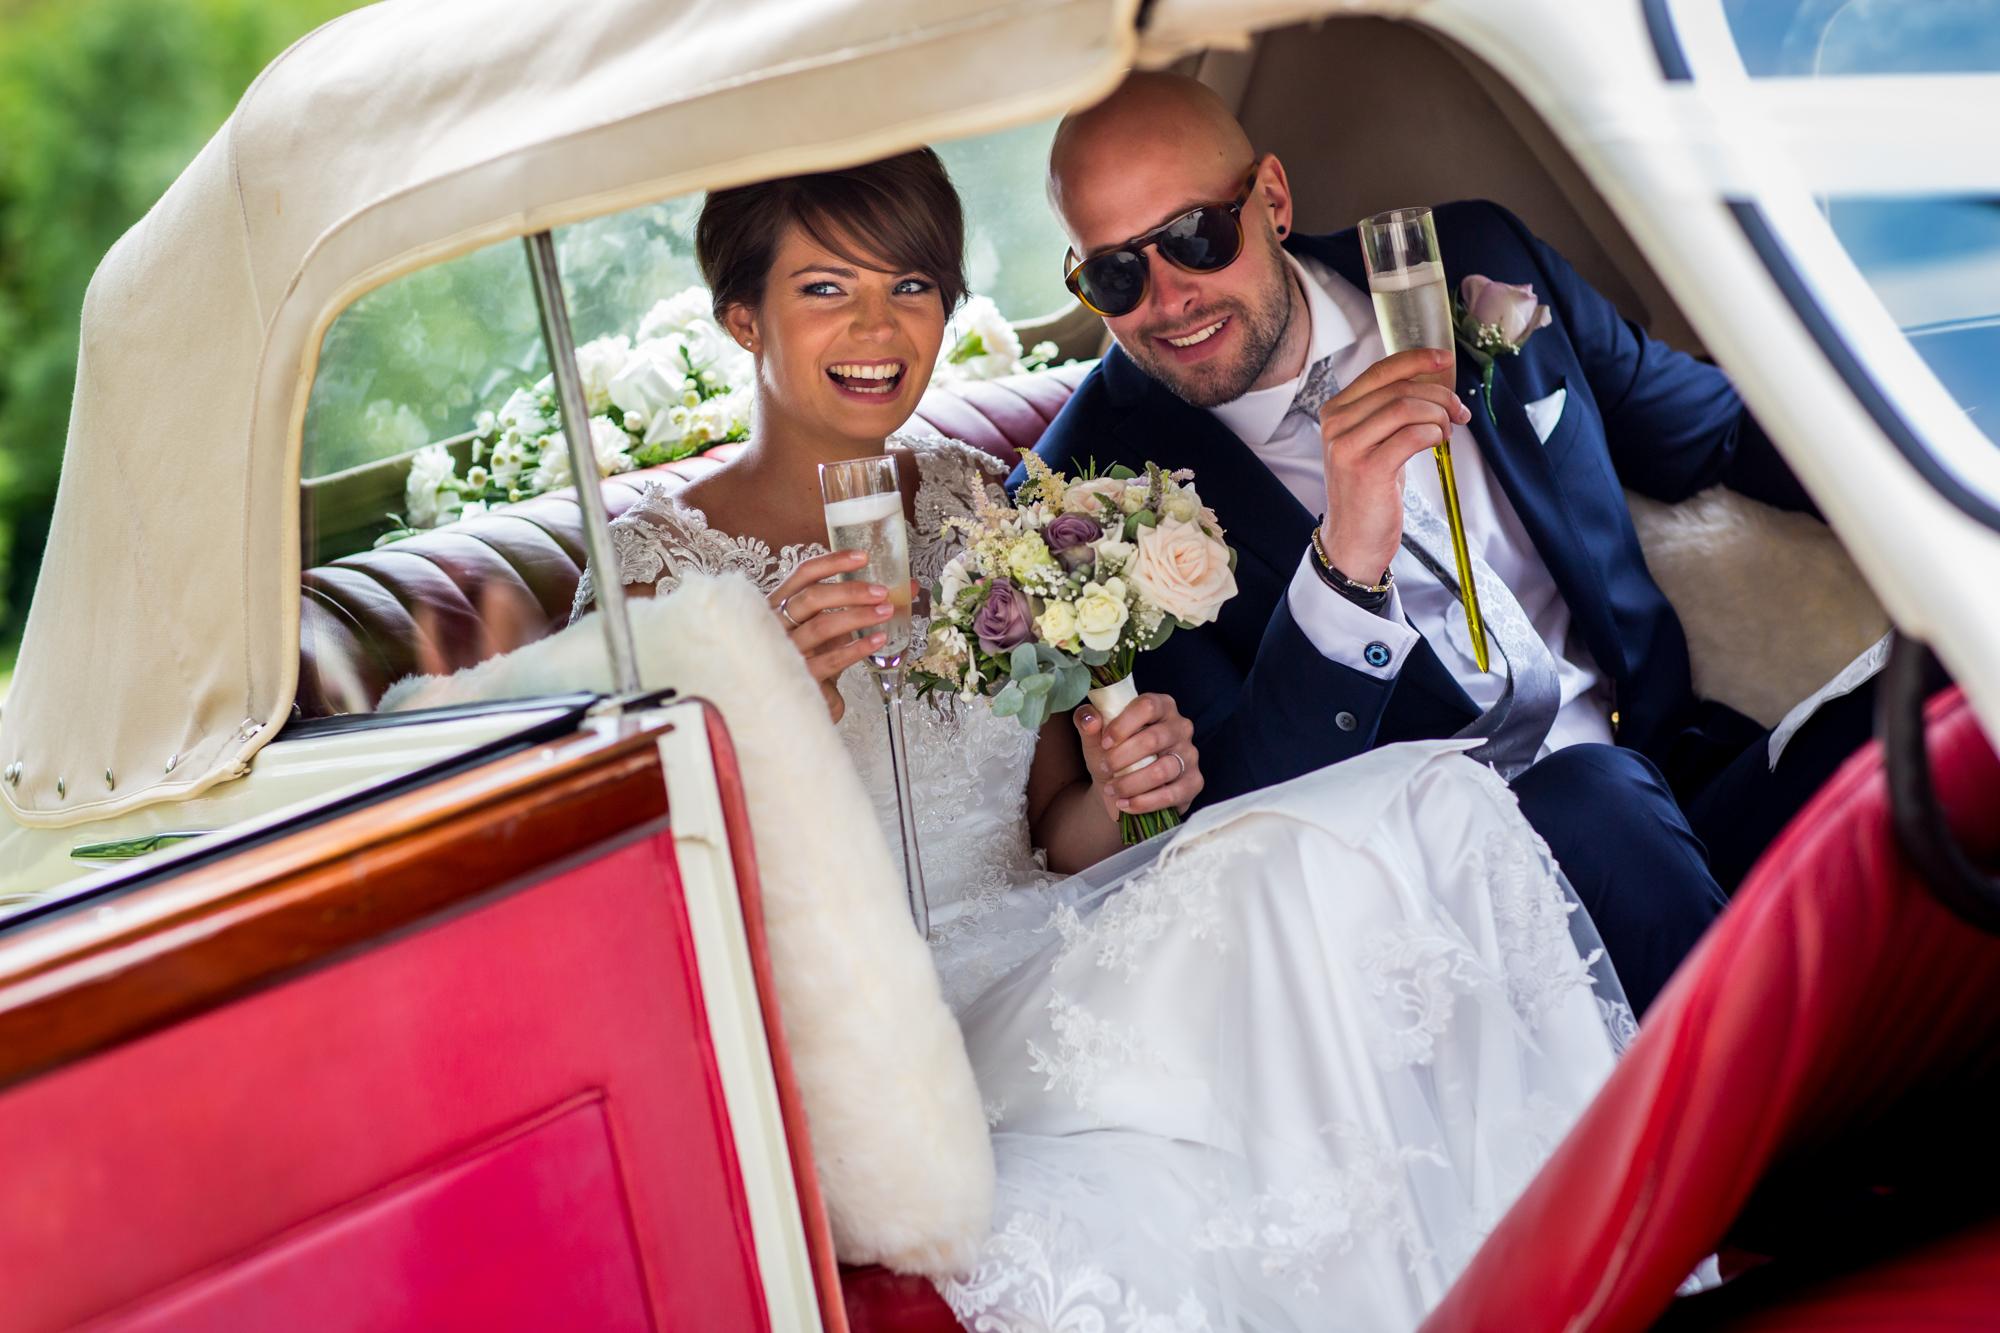 Jonny buckland wedding venues